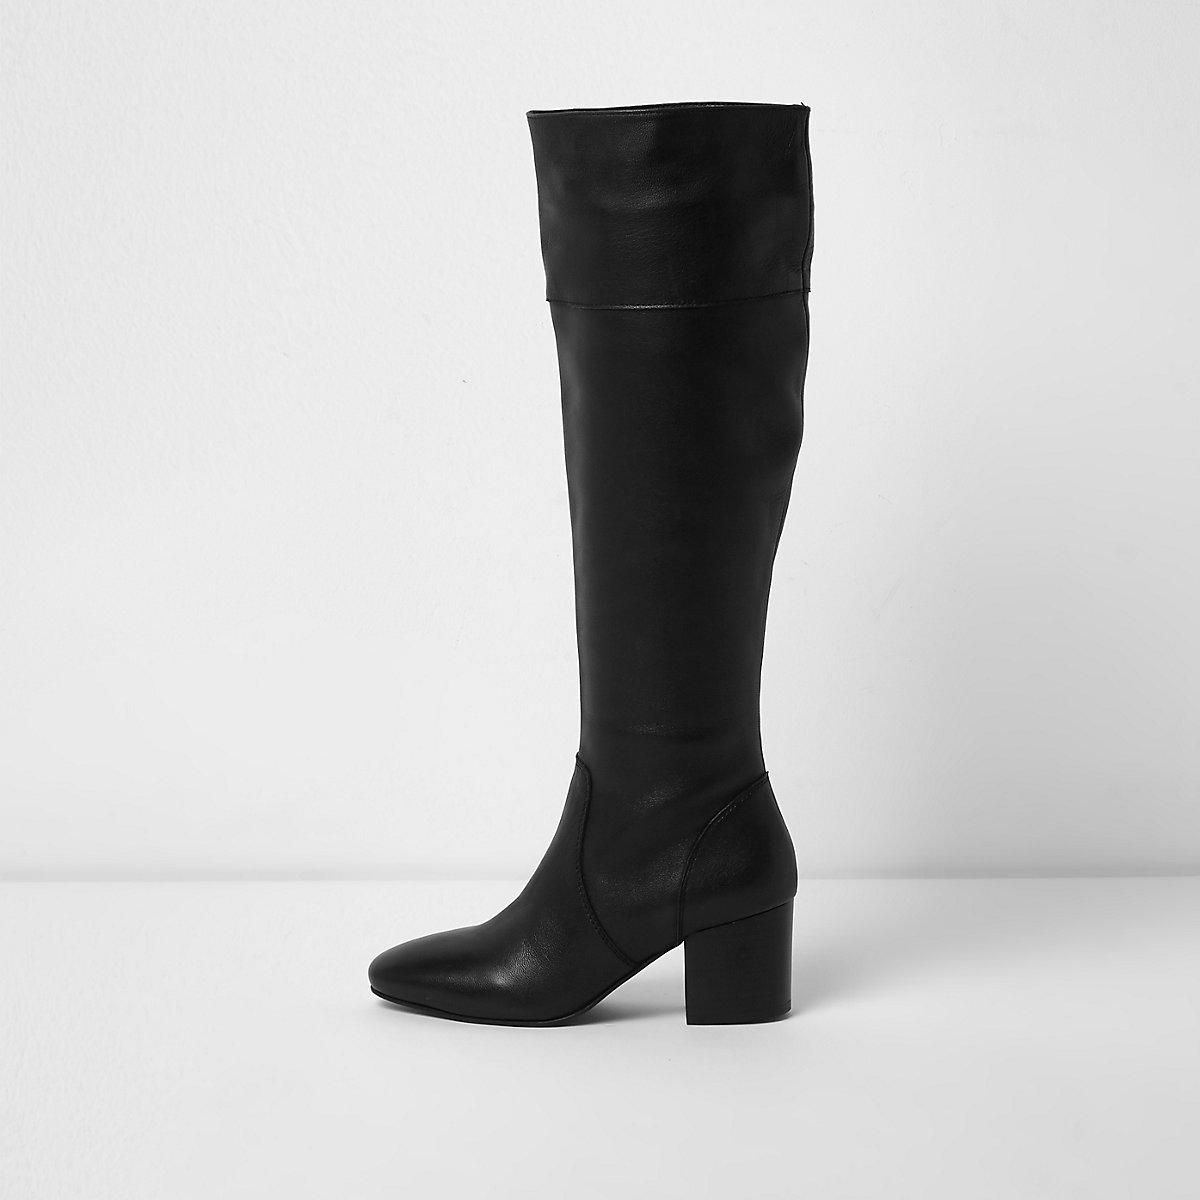 Black knee high leather block heel boots